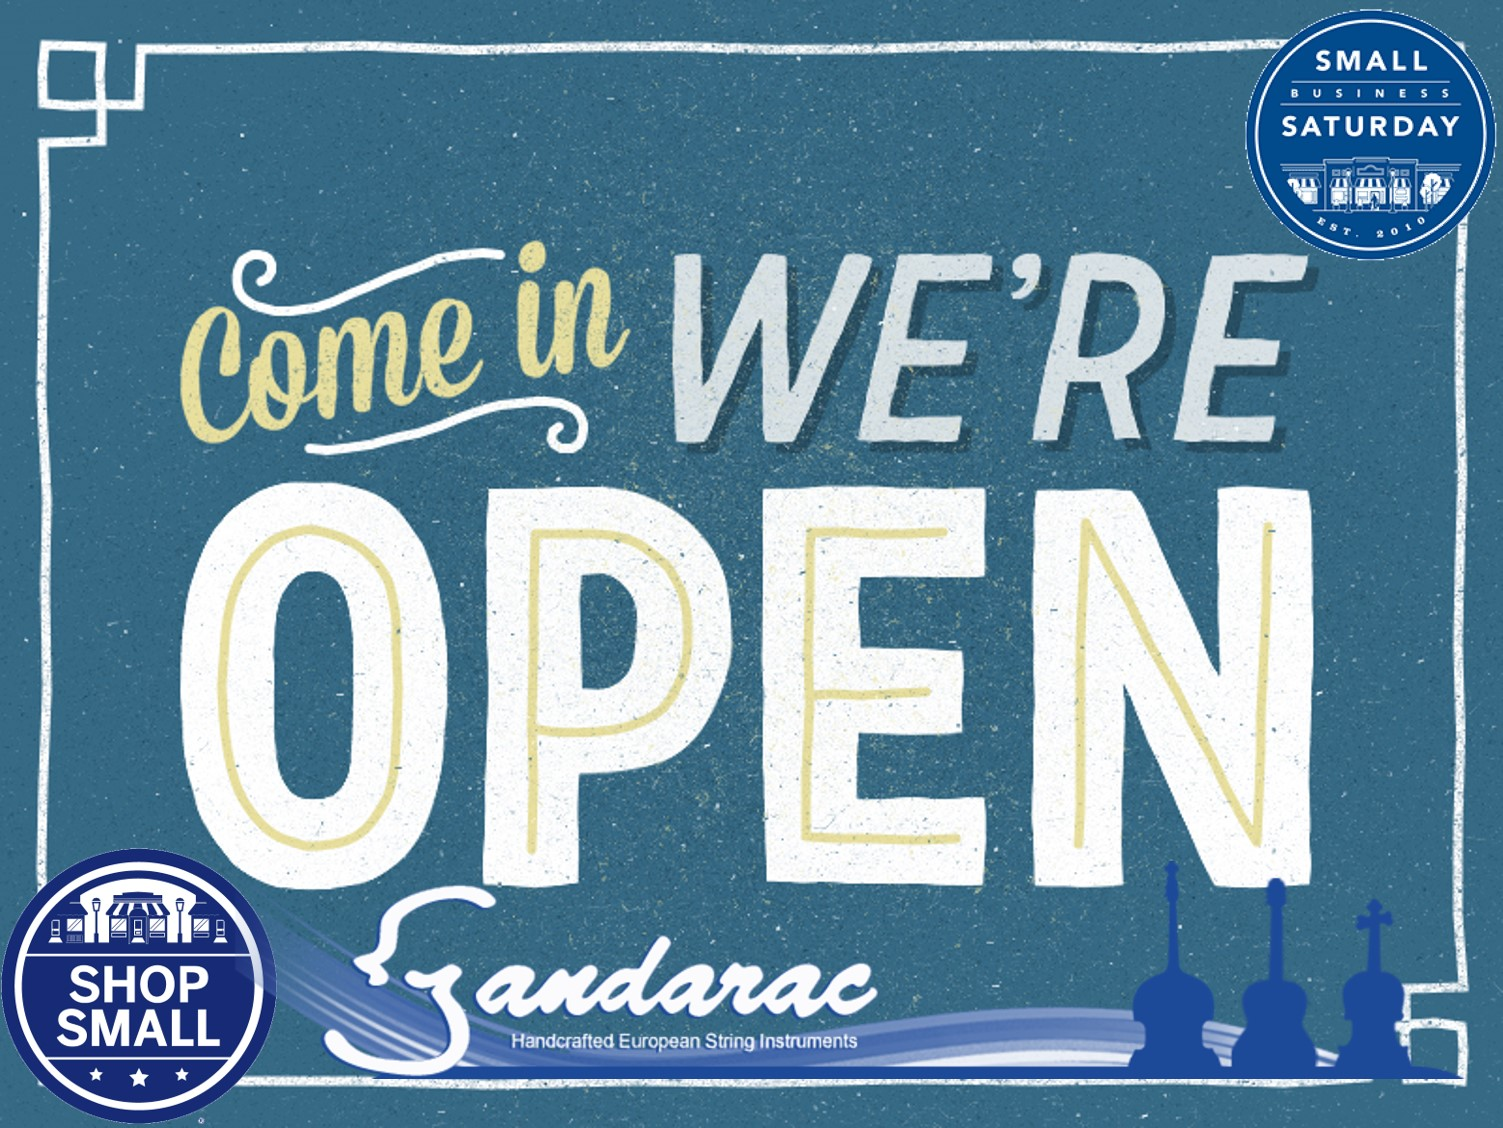 03-small-business-saturday-open